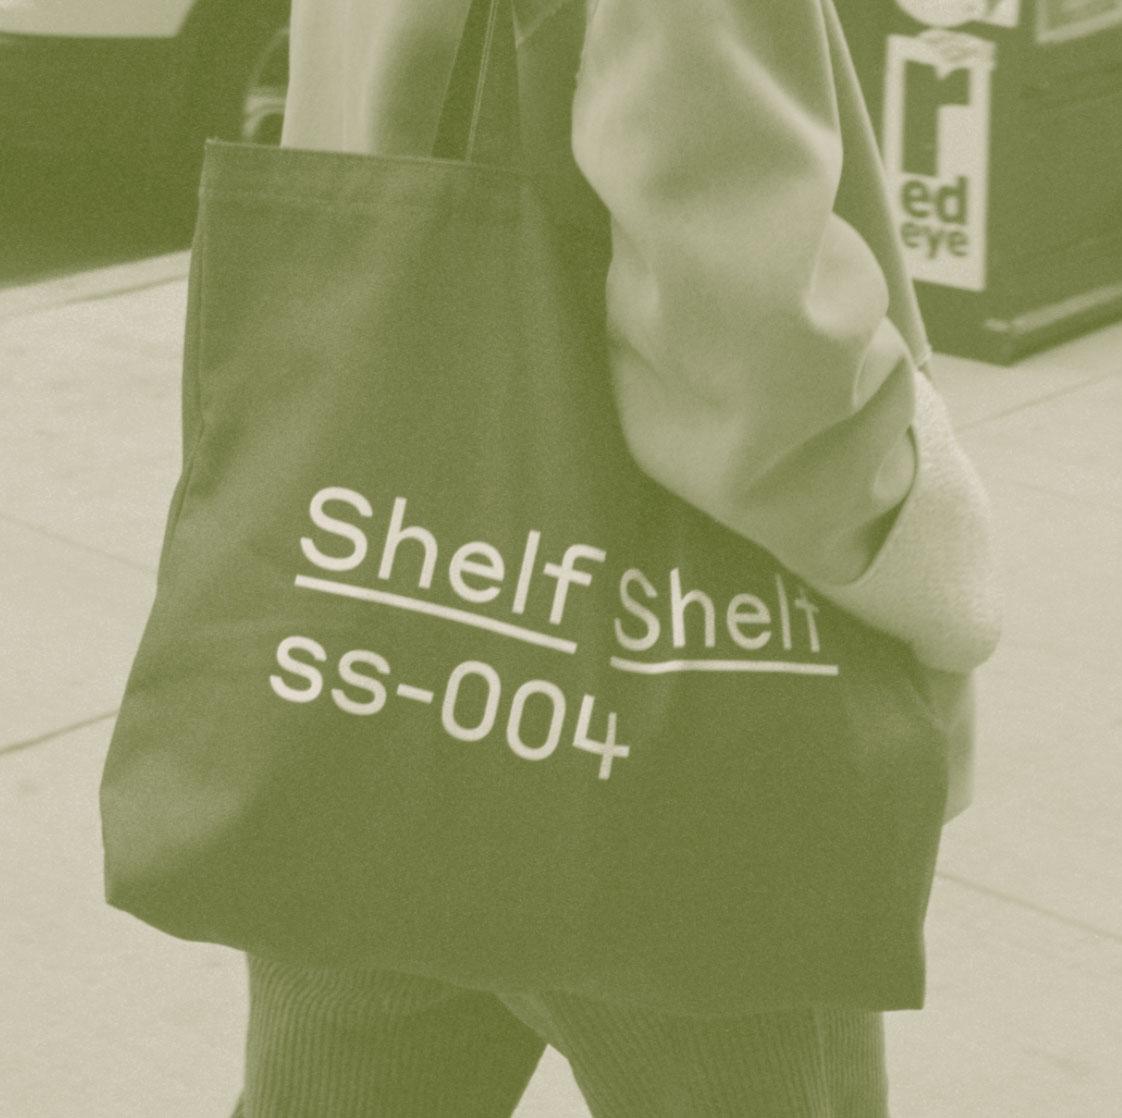 Shelf Shelf Book Launch: *ON / Rules*